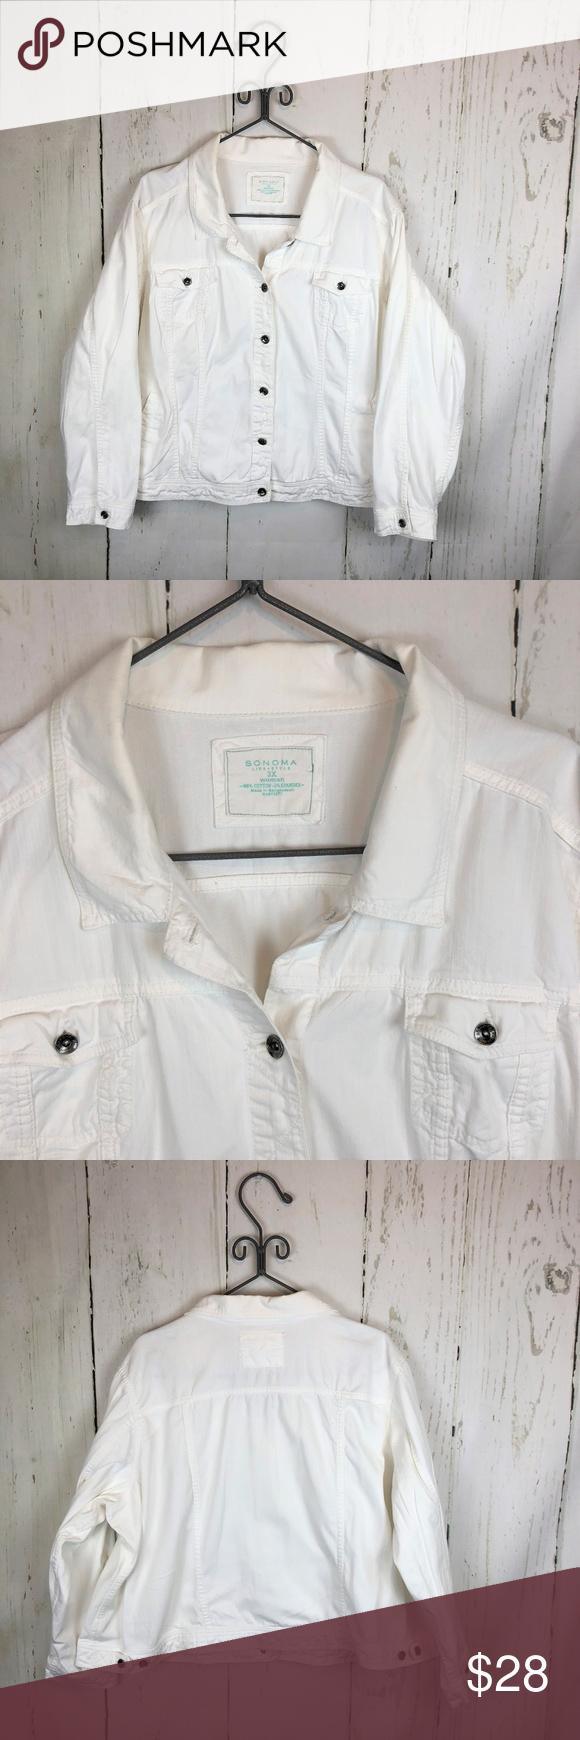 Sonoma Women S White Denim Jean Jacket Stretchy Denim Jean Jacket White Denim White Denim Jeans [ 1740 x 580 Pixel ]